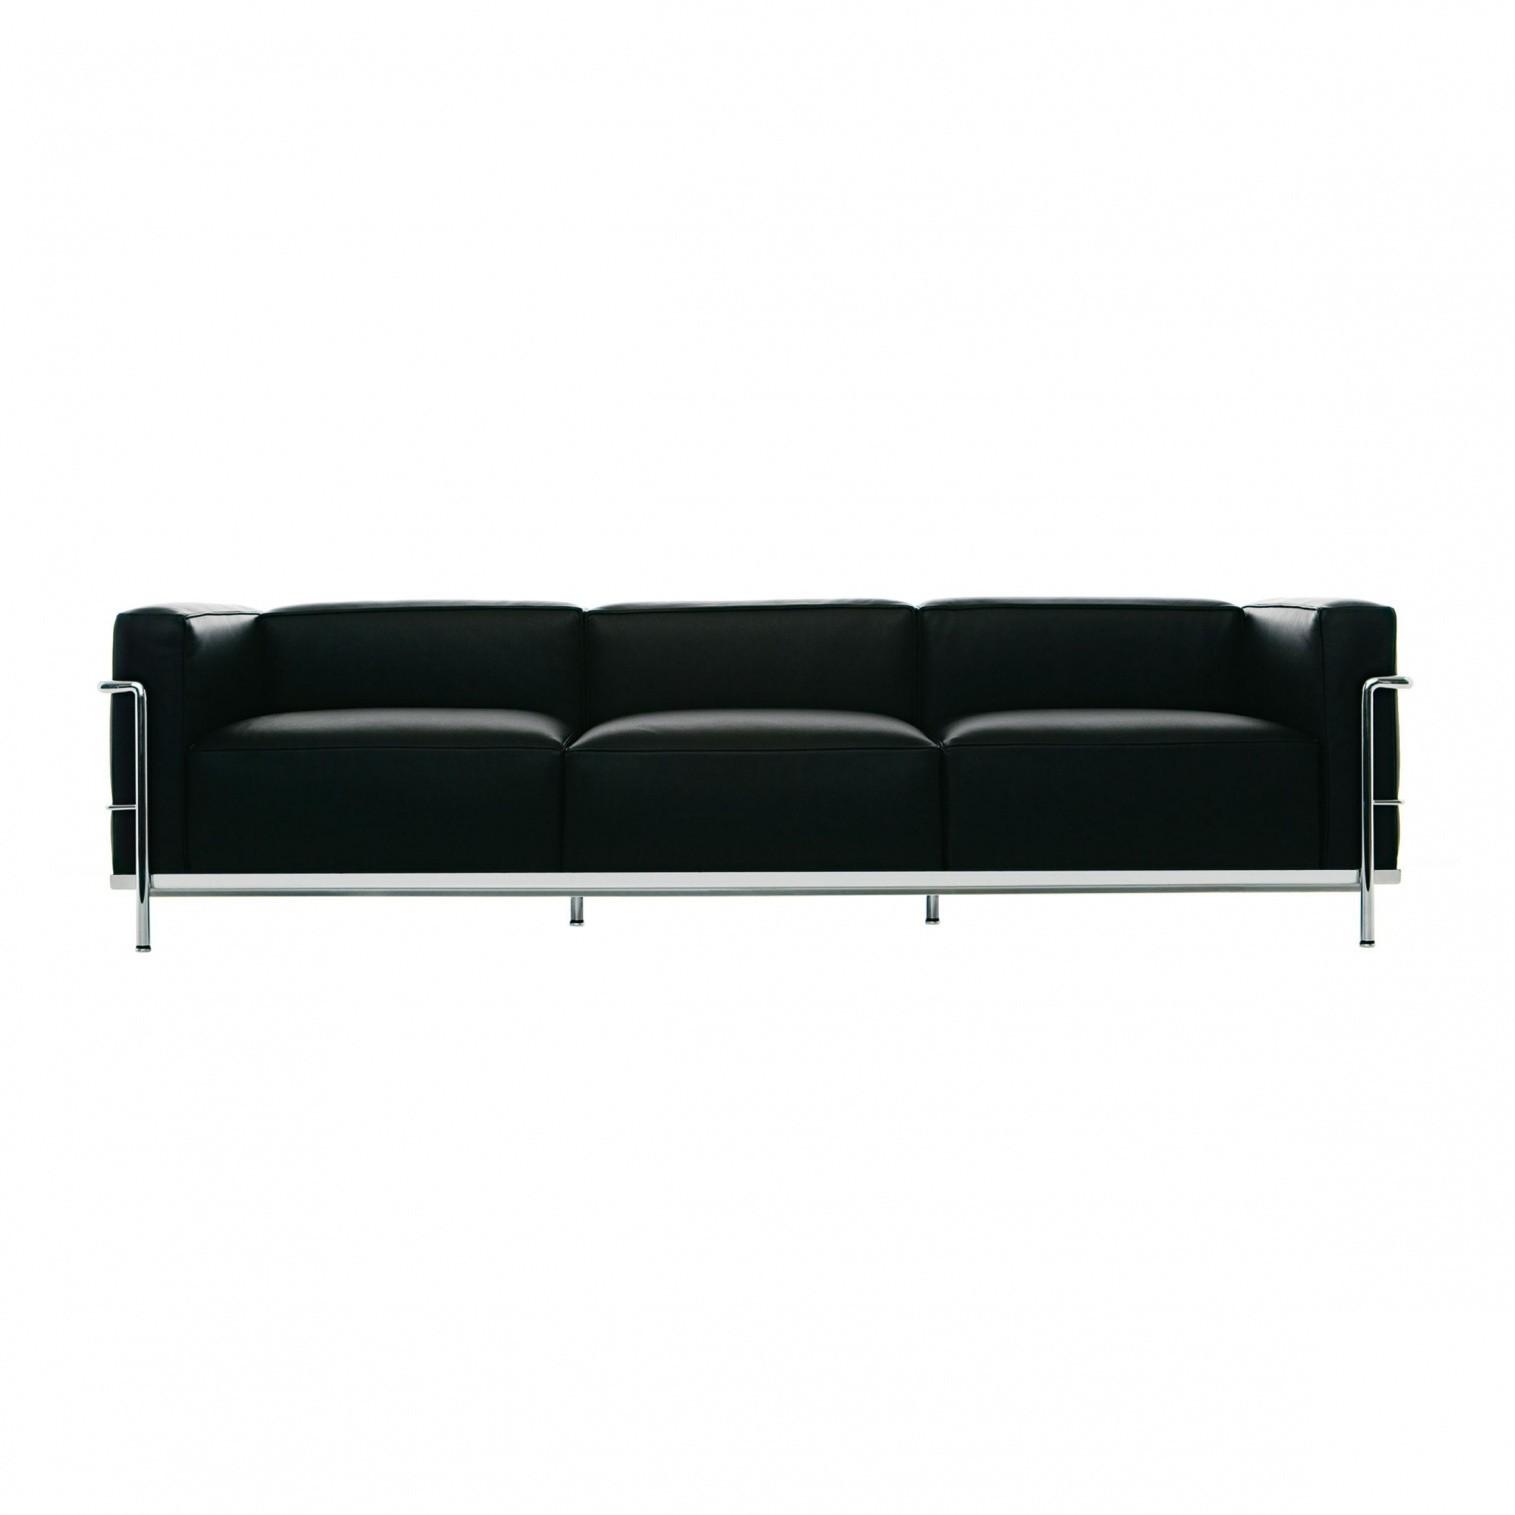 Cina Le Corbusier Lc3 Sofa 3 Seater